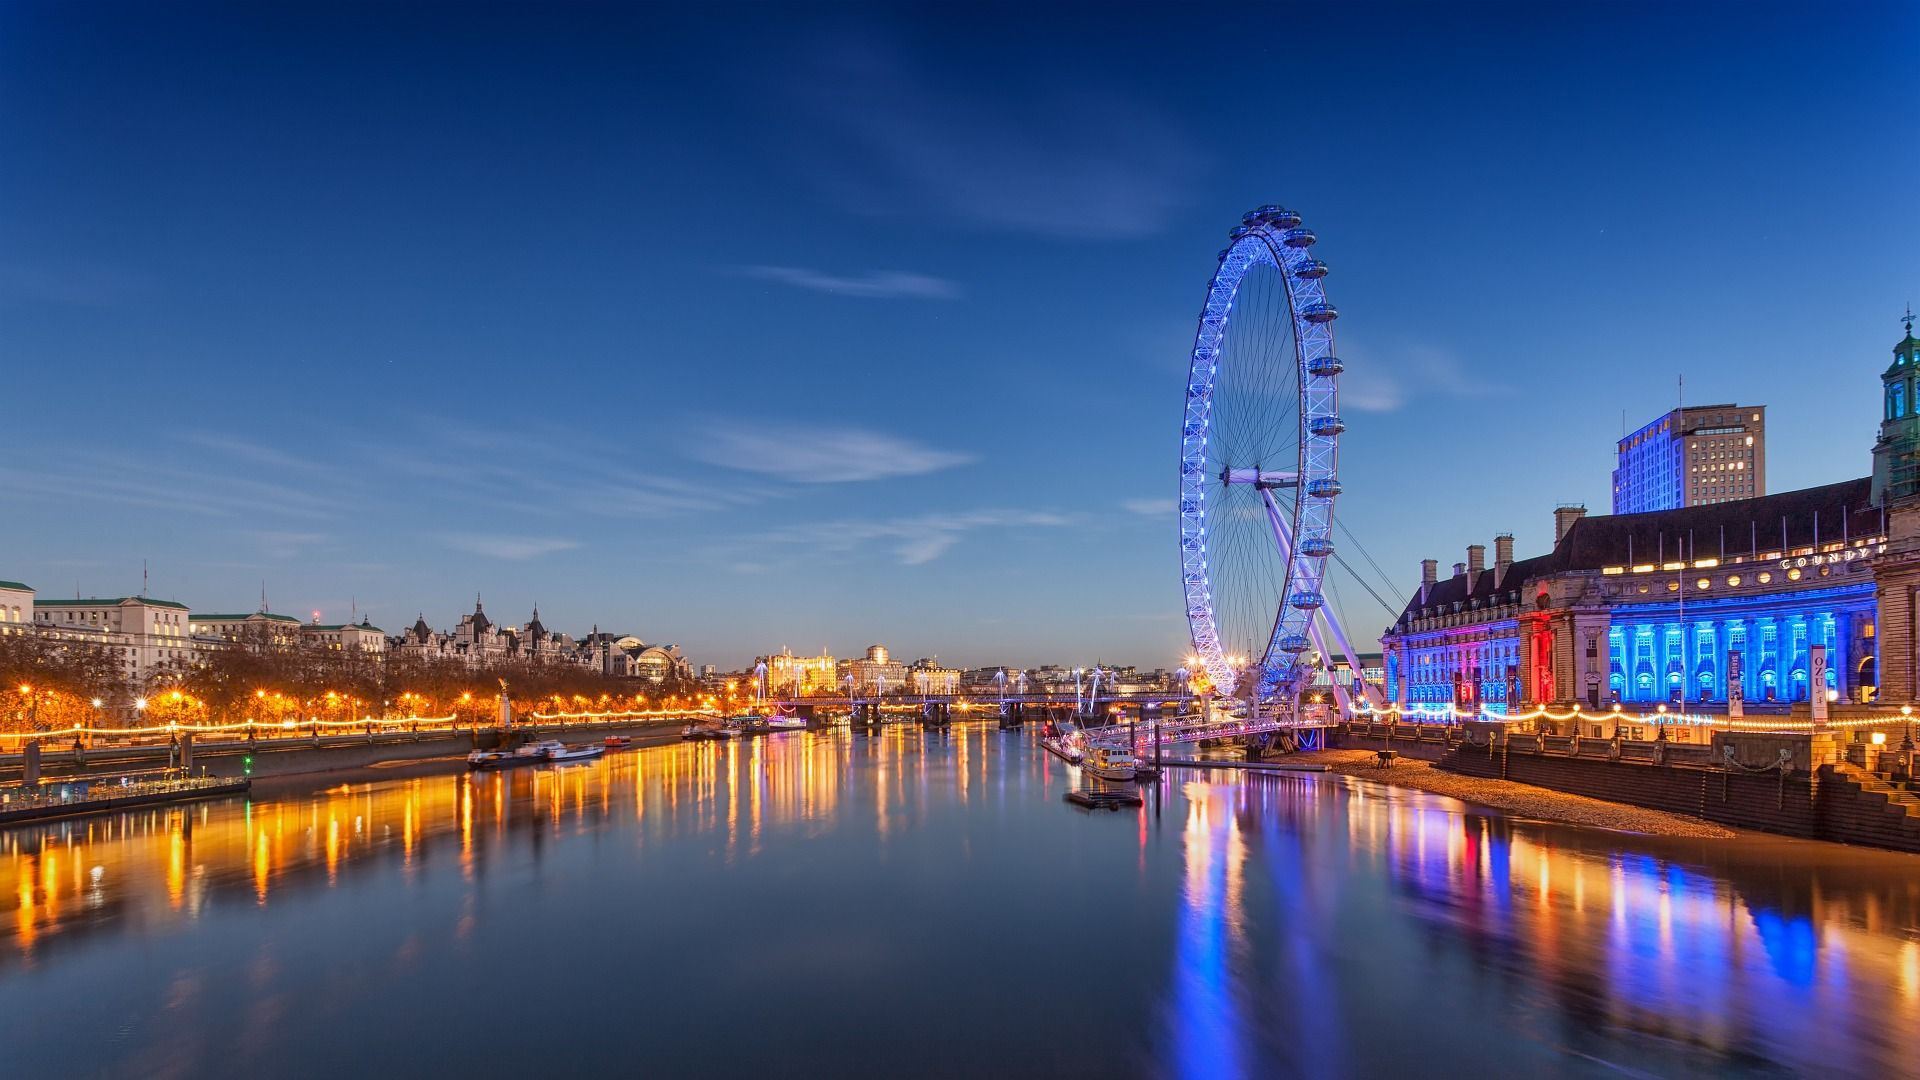 Atemberaubender Blick Uber Ganz London 3 Oder 4 Tage Citytrip In Grossbritanniens Hauptstadt Mit Flug 4 S London Wallpaper Visit London Things To Do In London